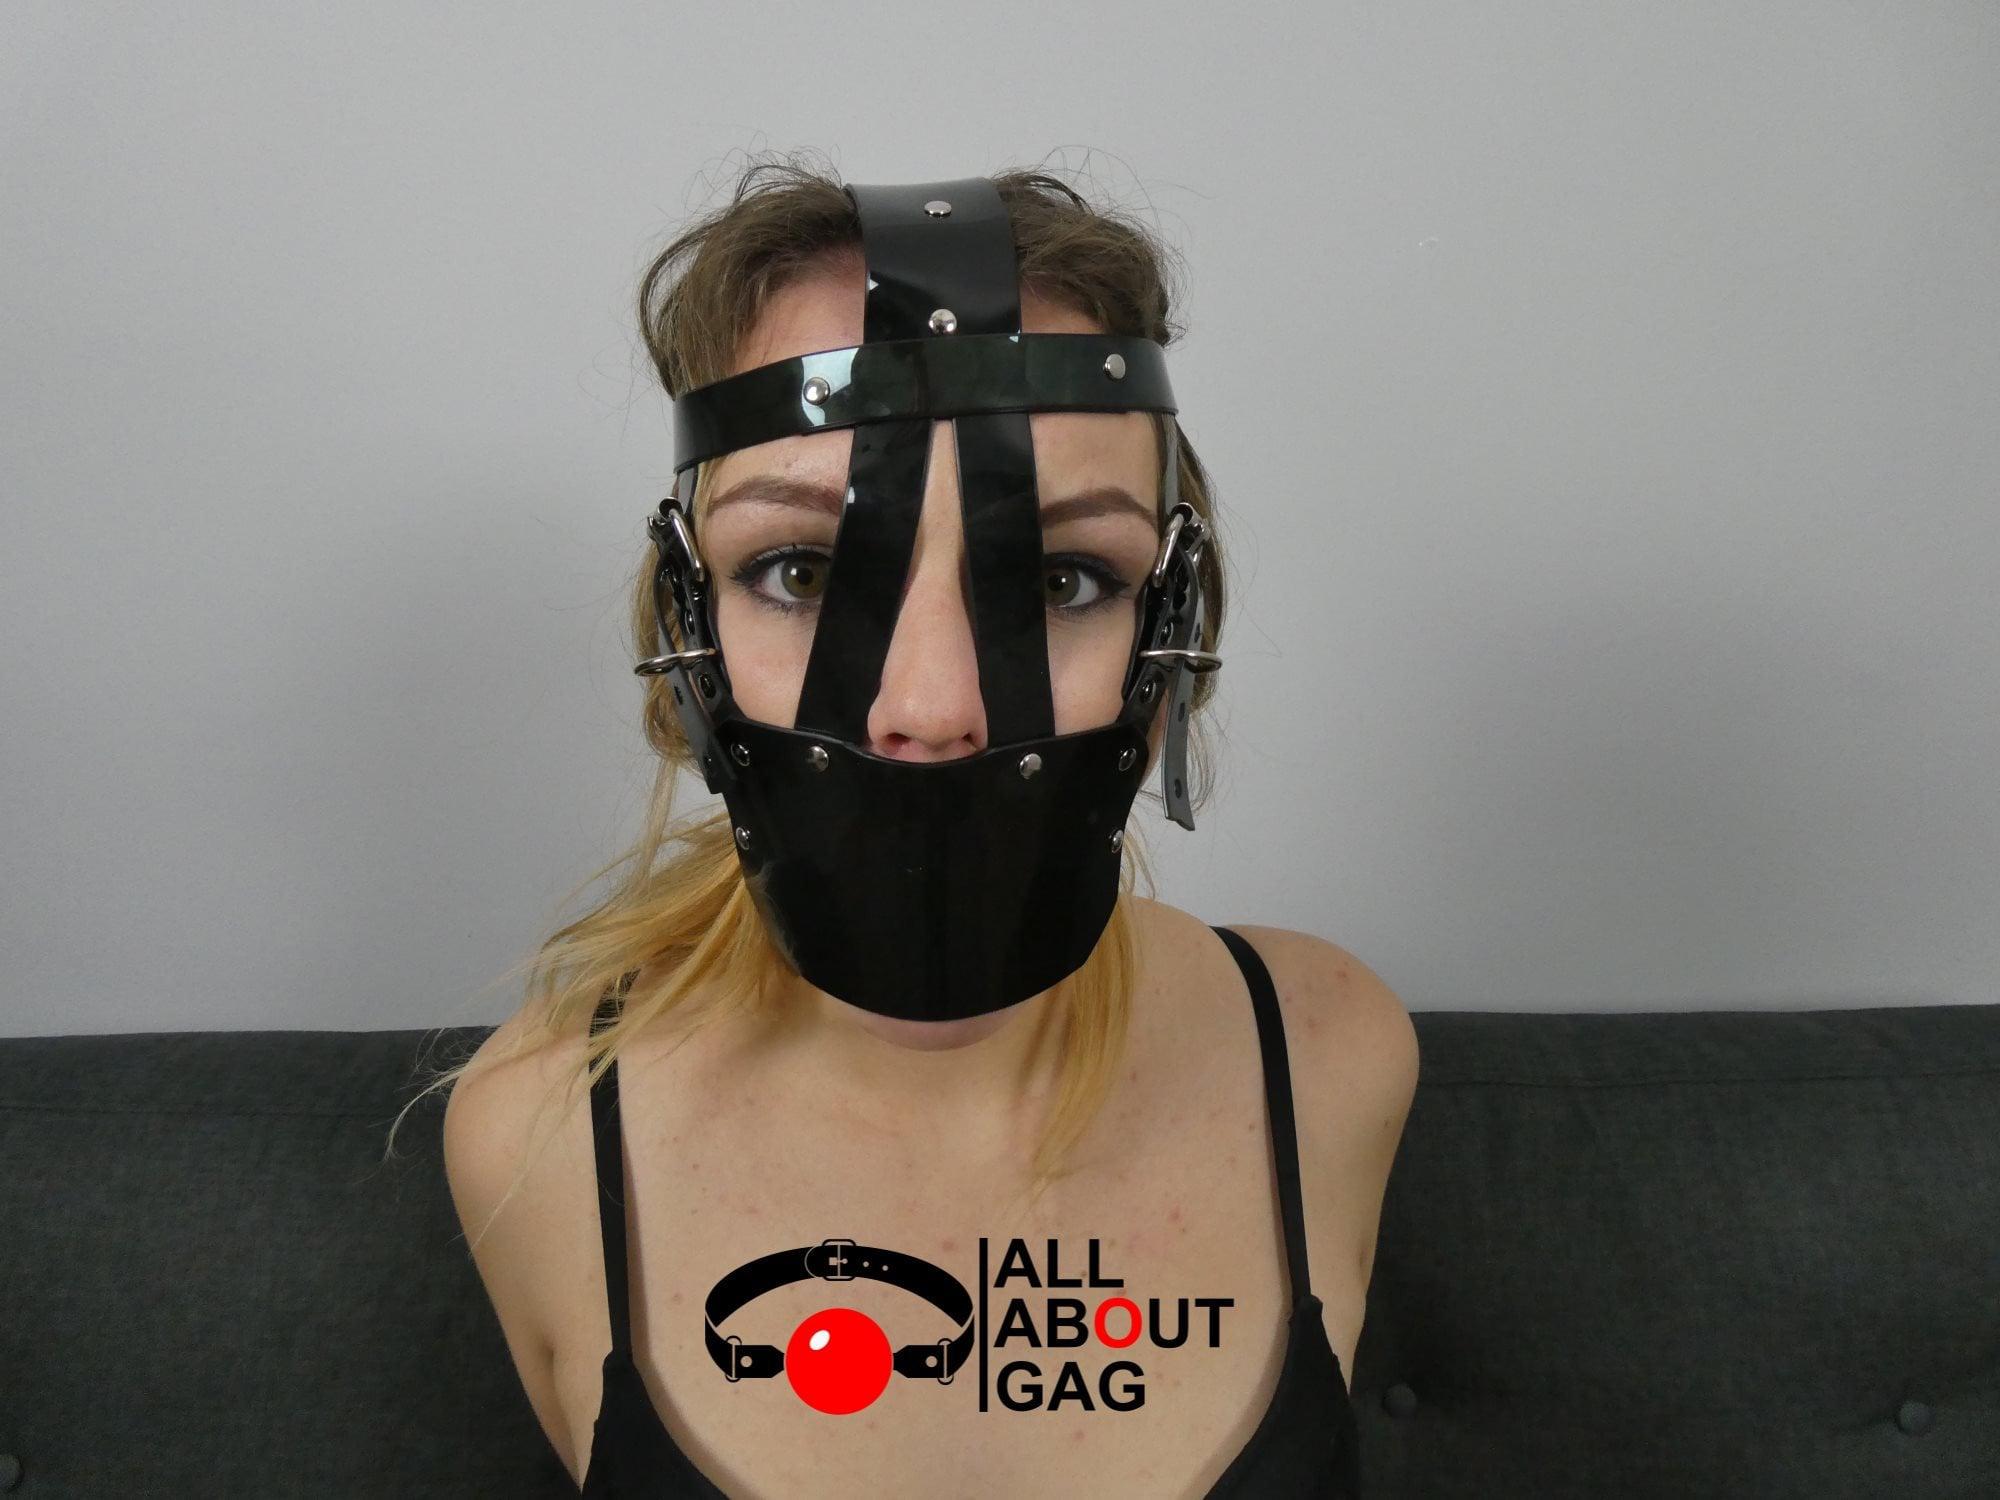 Ball gag girl